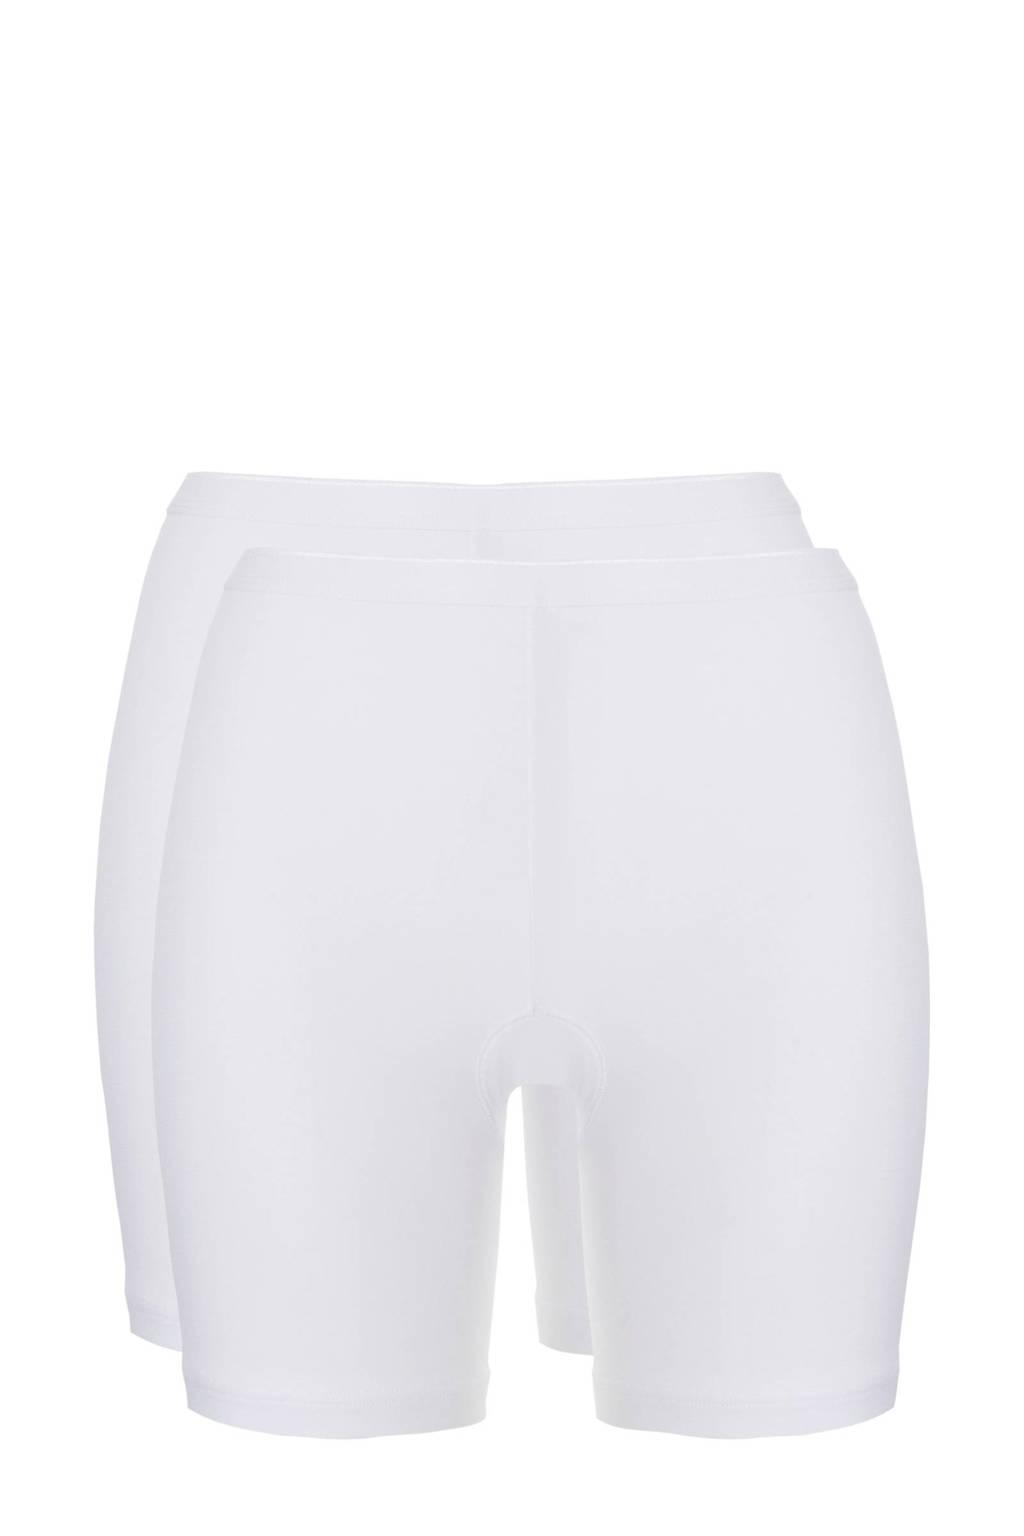 ten Cate Basic short (set van 2) wit, Wit